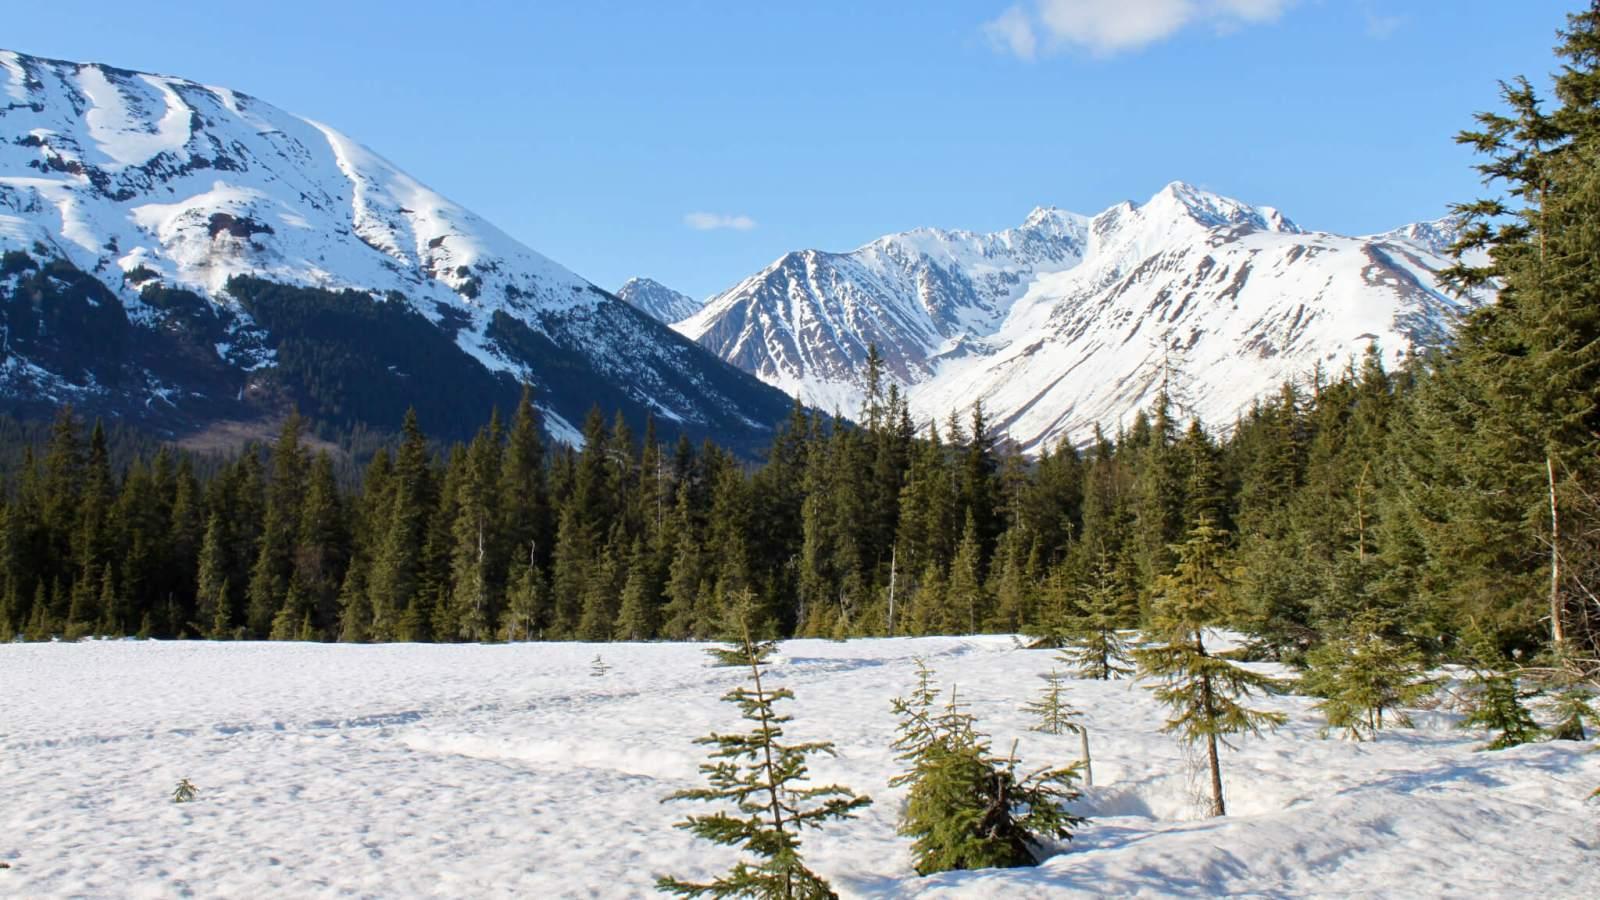 Early spring in Girdwood, Alaska